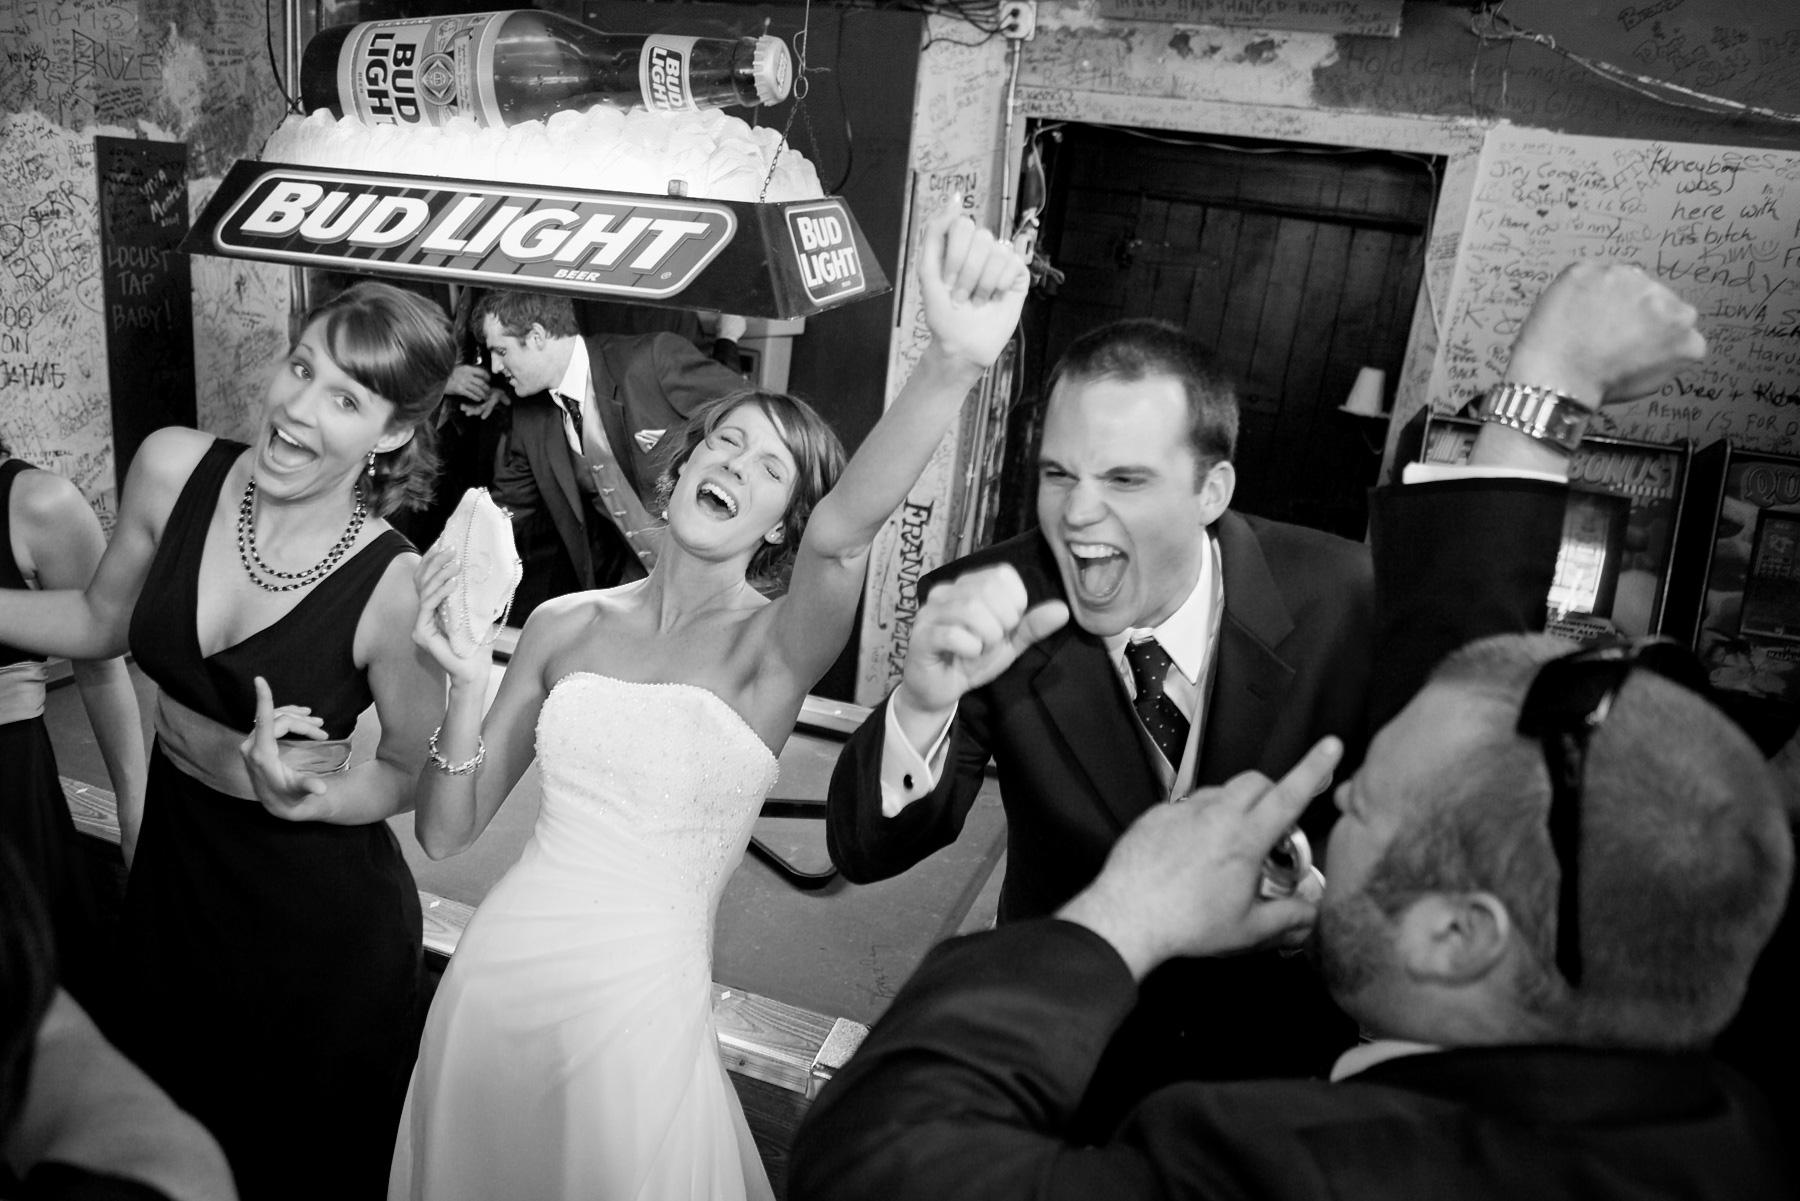 wedding-photography-saint-paul-mark-kegans-623.jpg